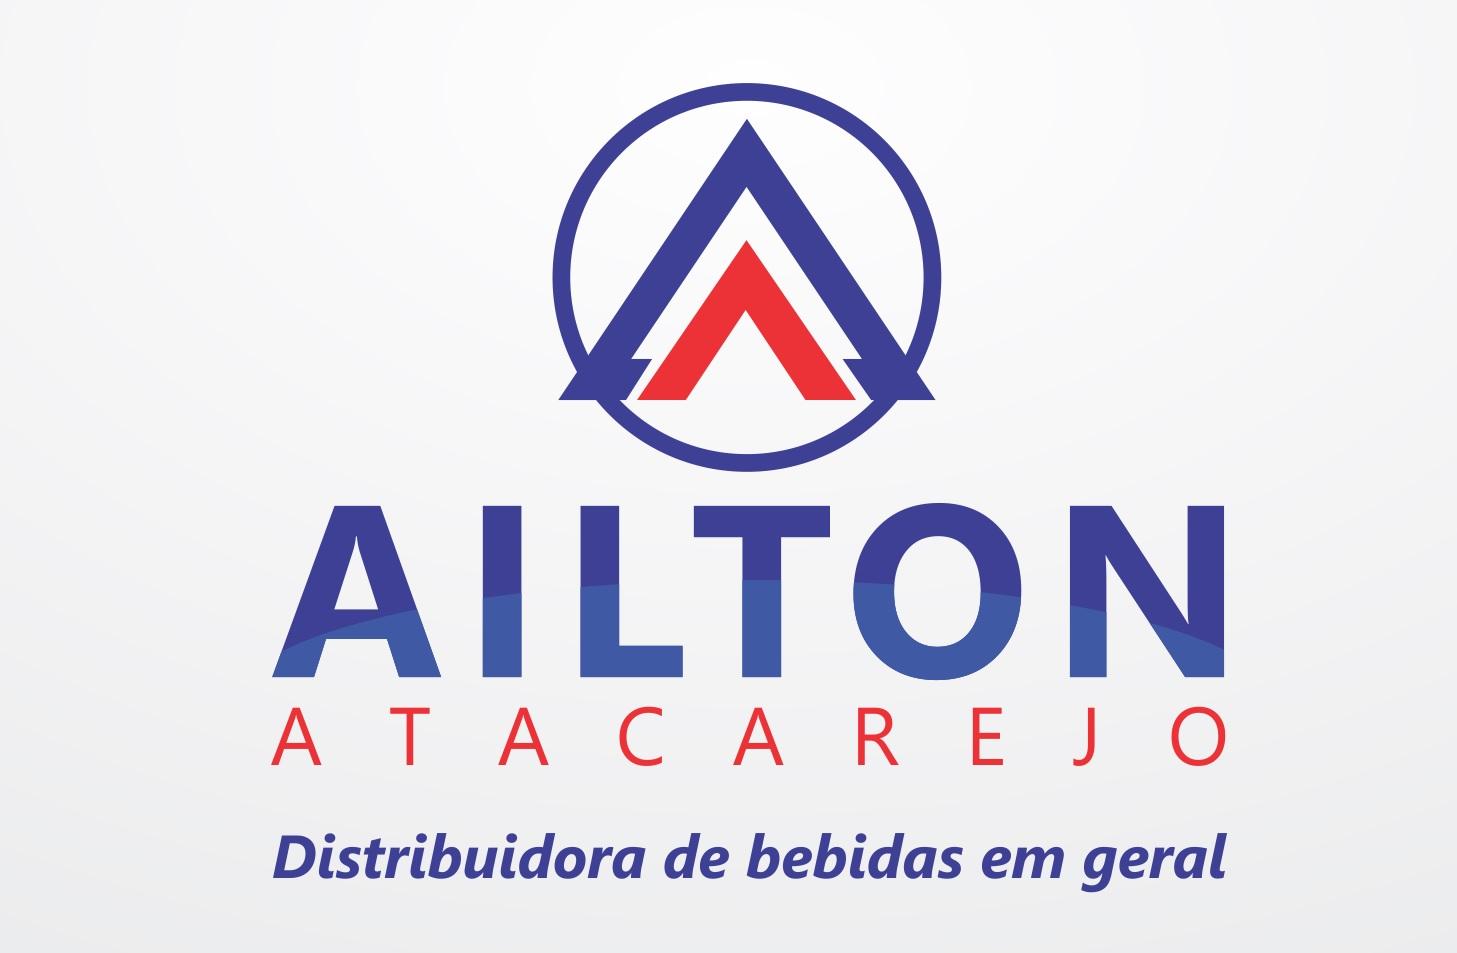 Ailton Atacarejo